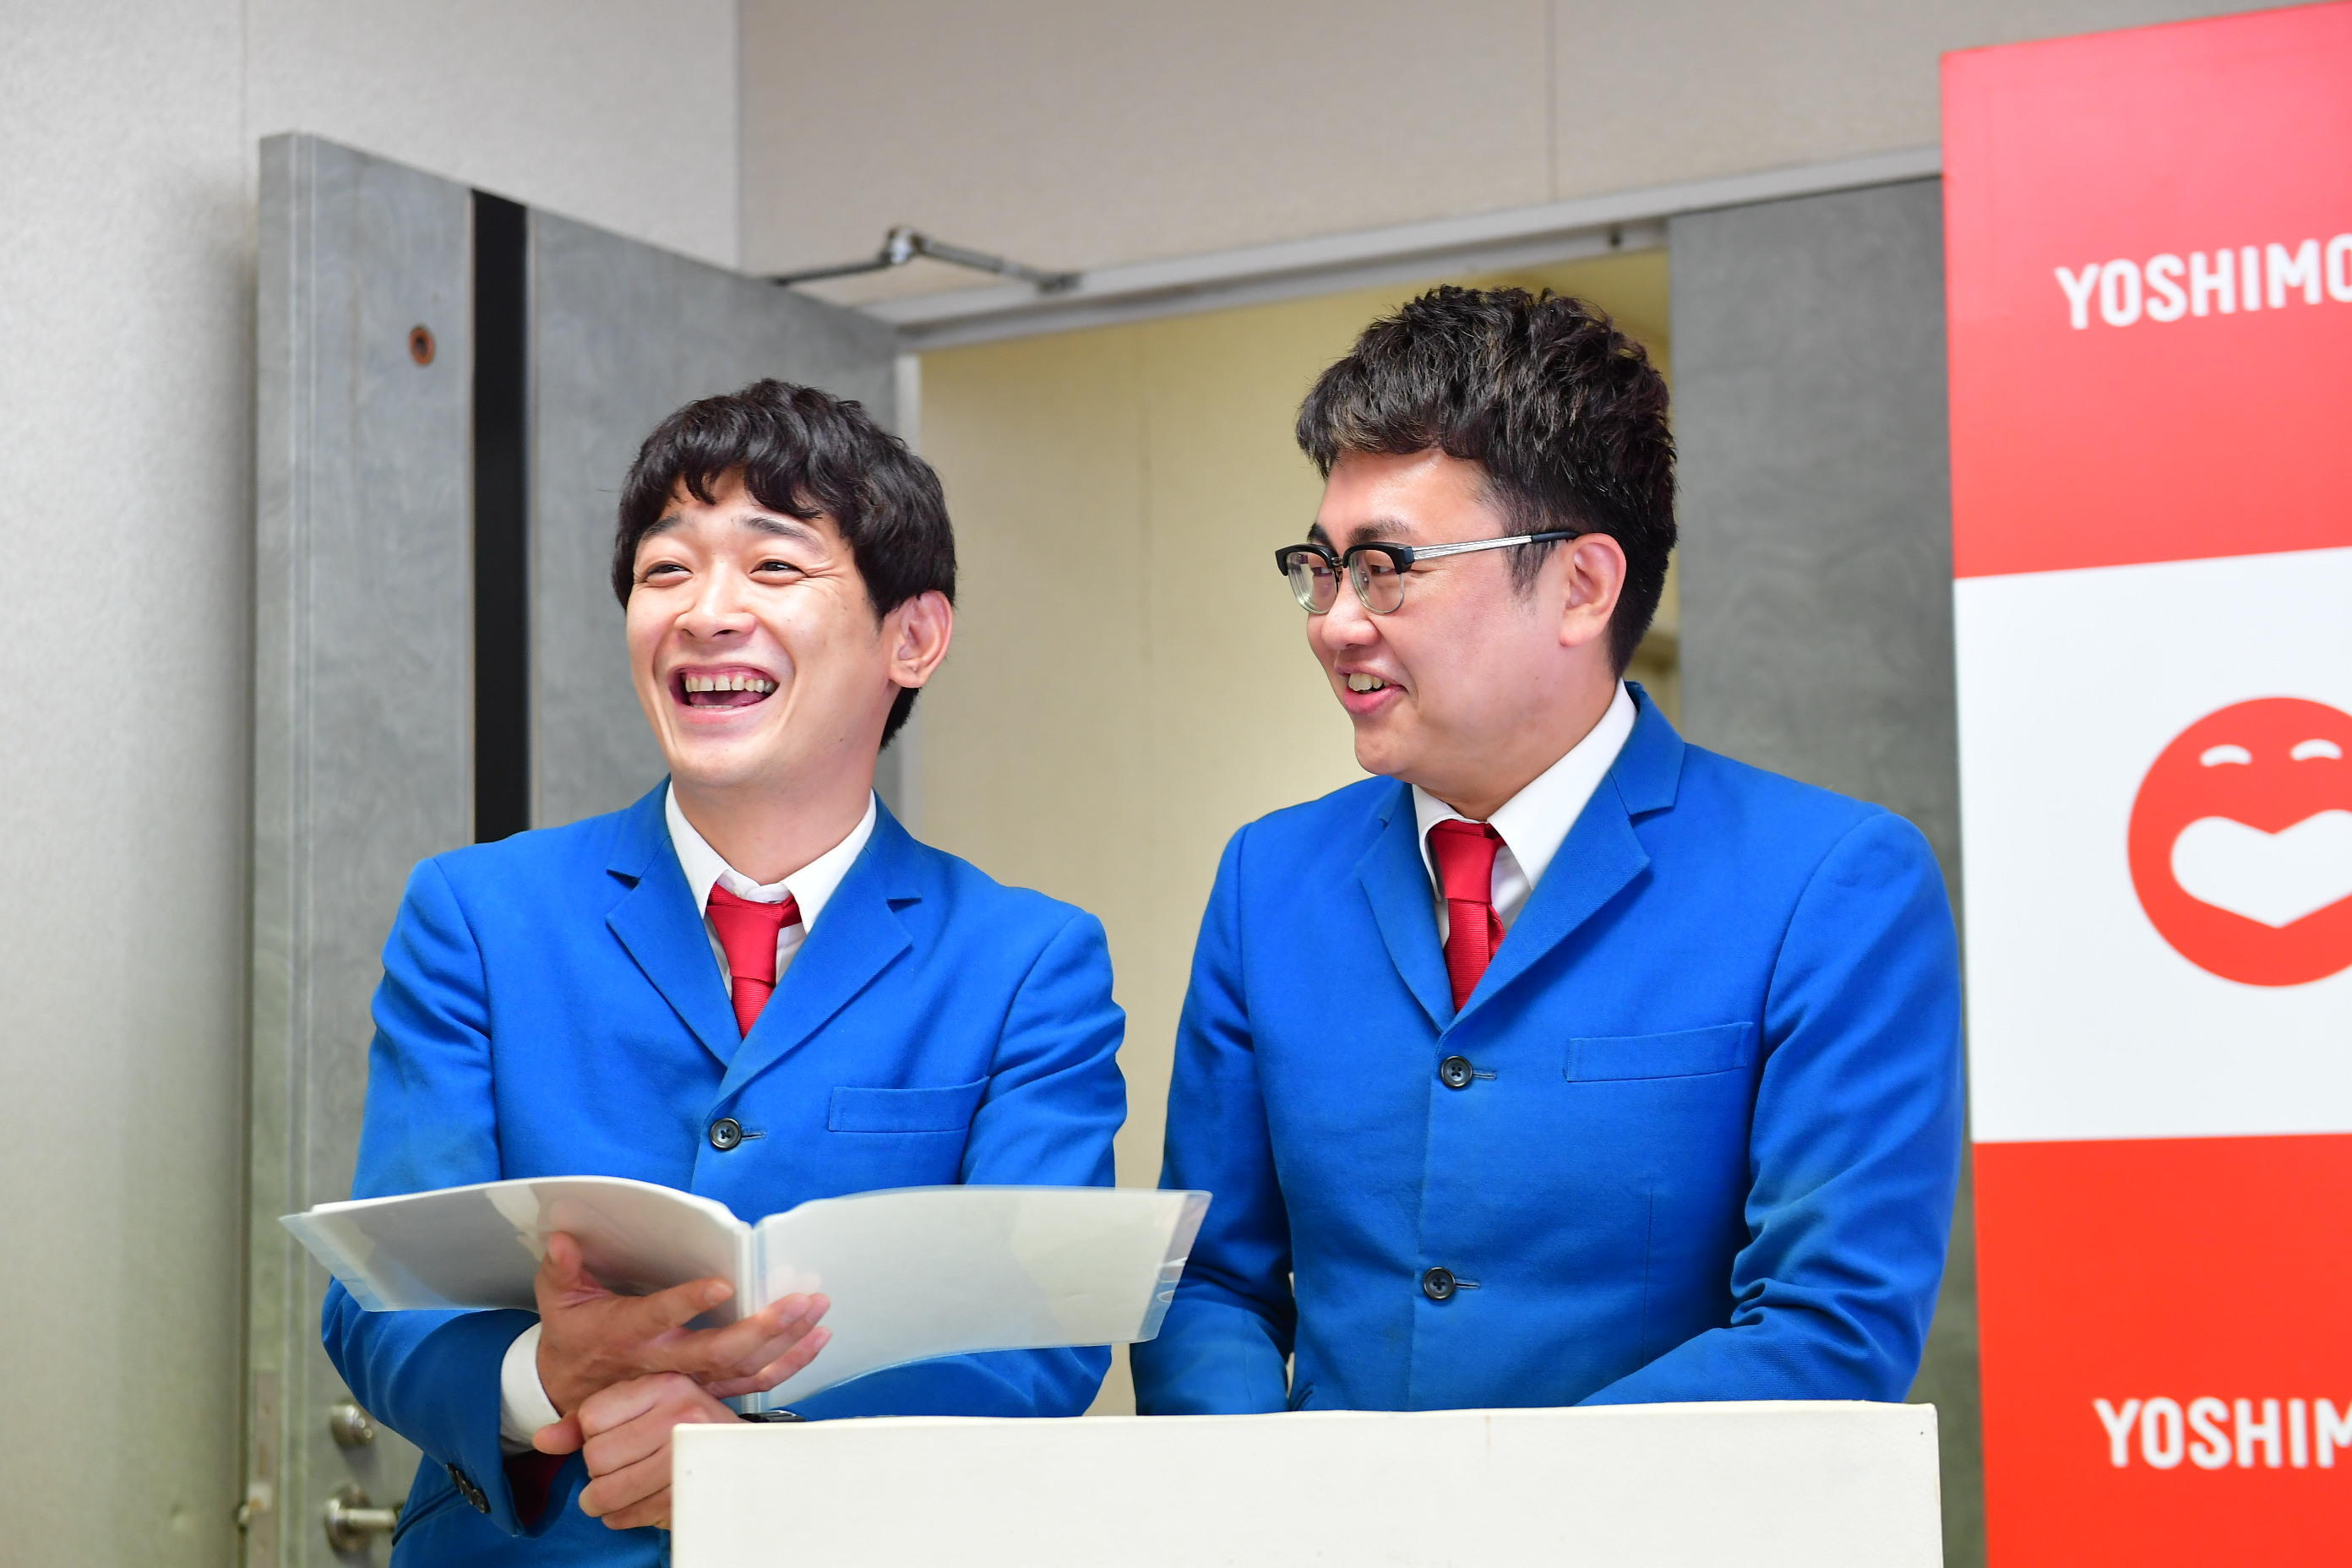 http://news.yoshimoto.co.jp/20180919161123-0c8f9503d1982eb5ced1255e42fafe607ea166bd.jpg